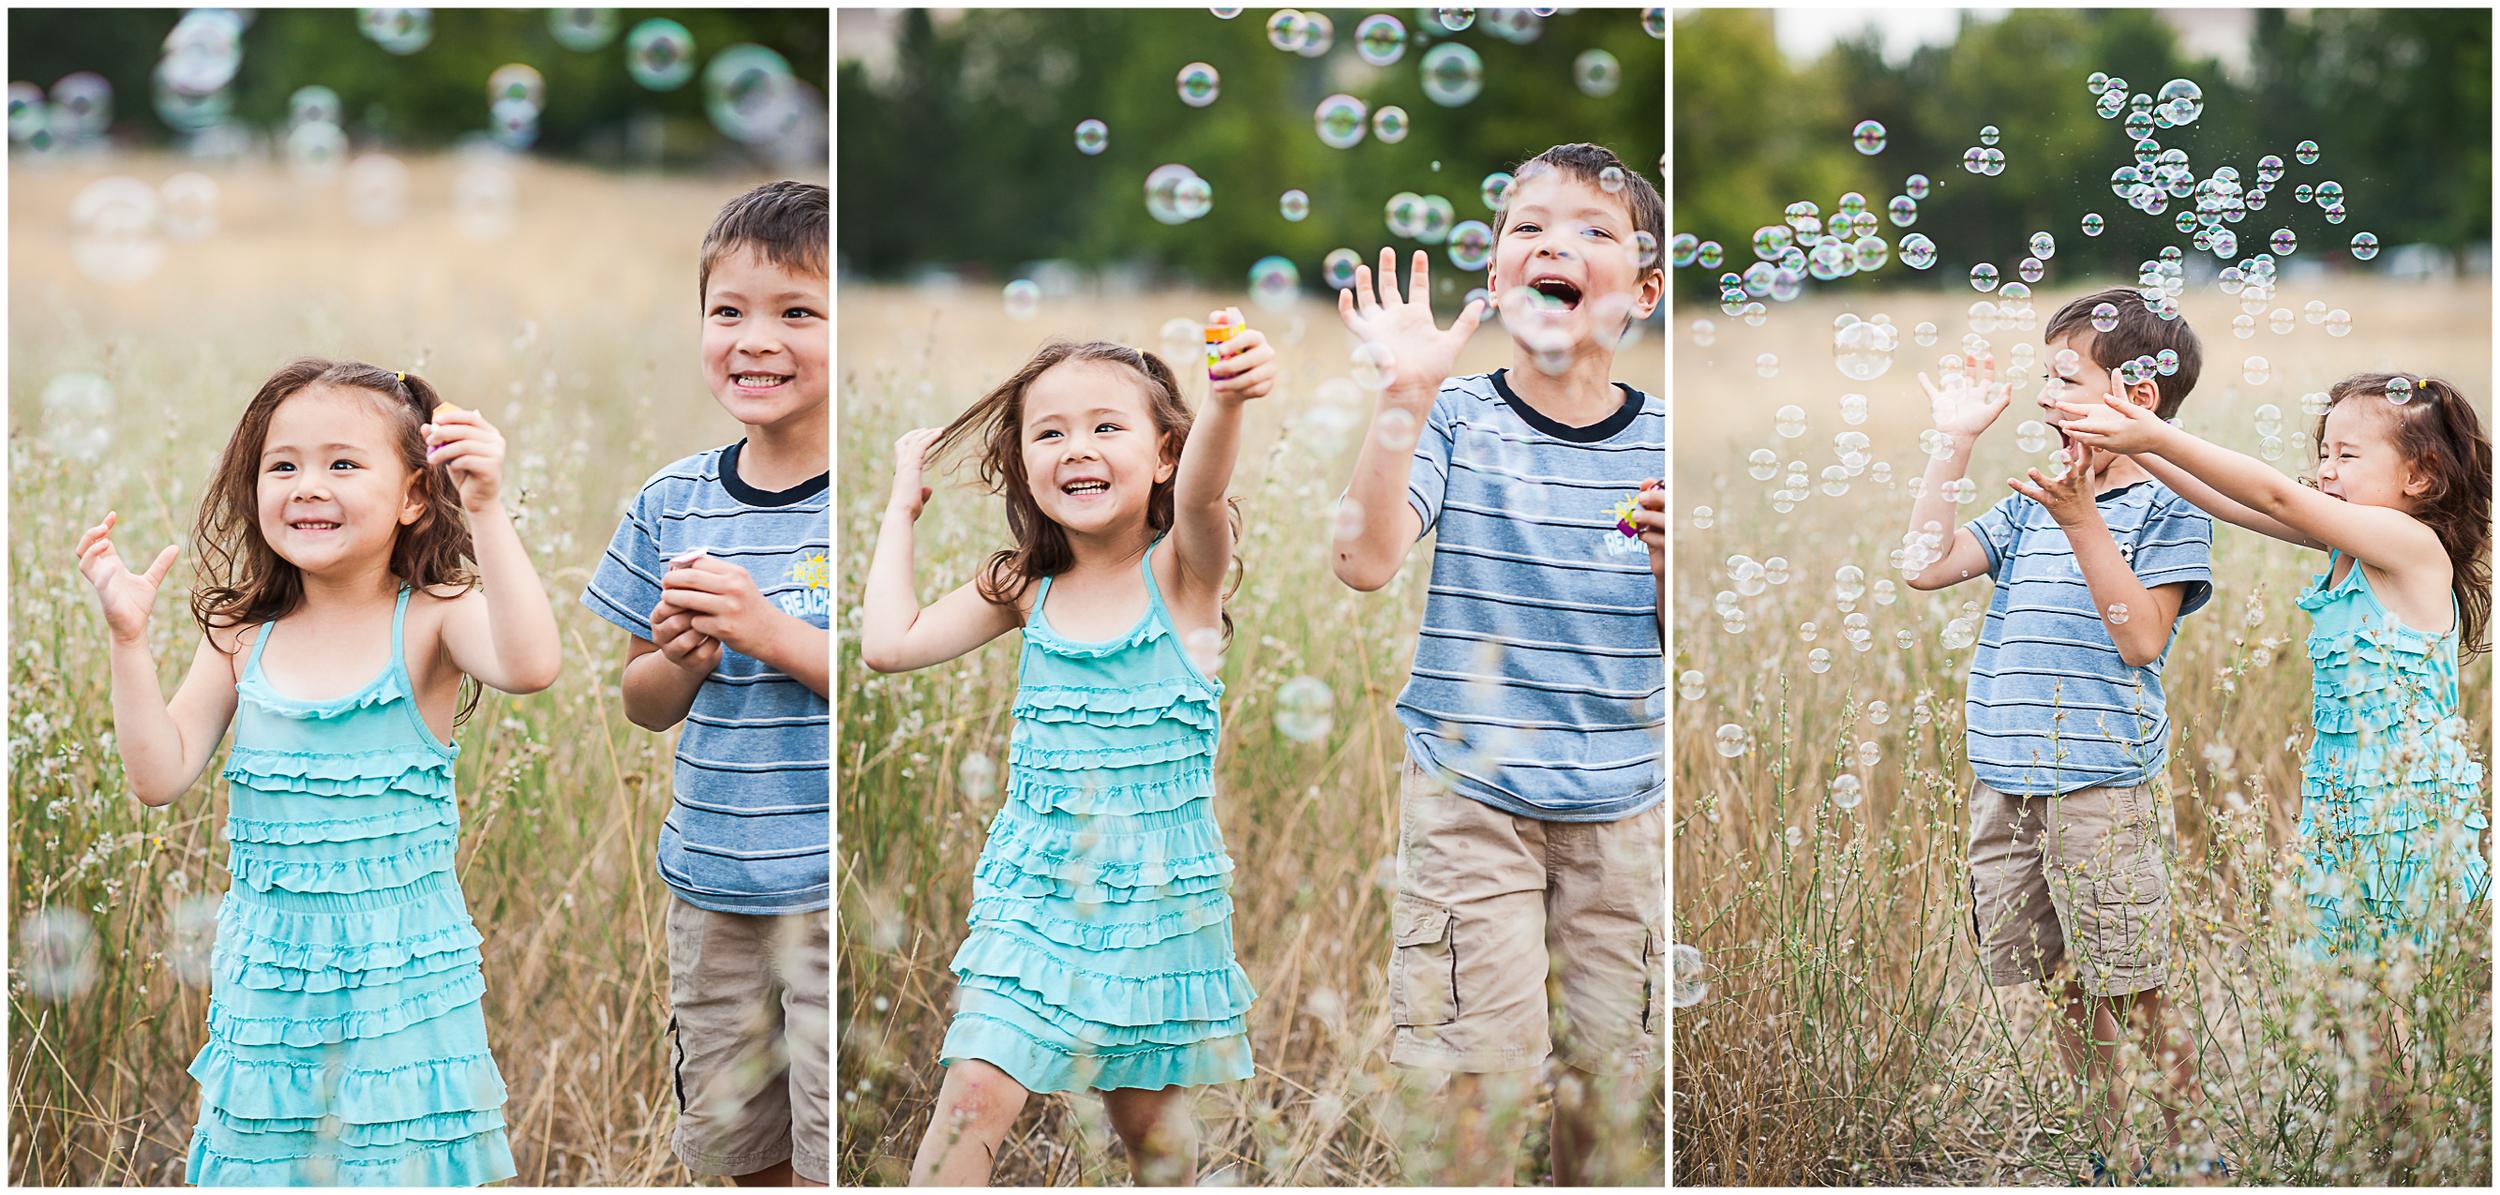 bubbles, siblings